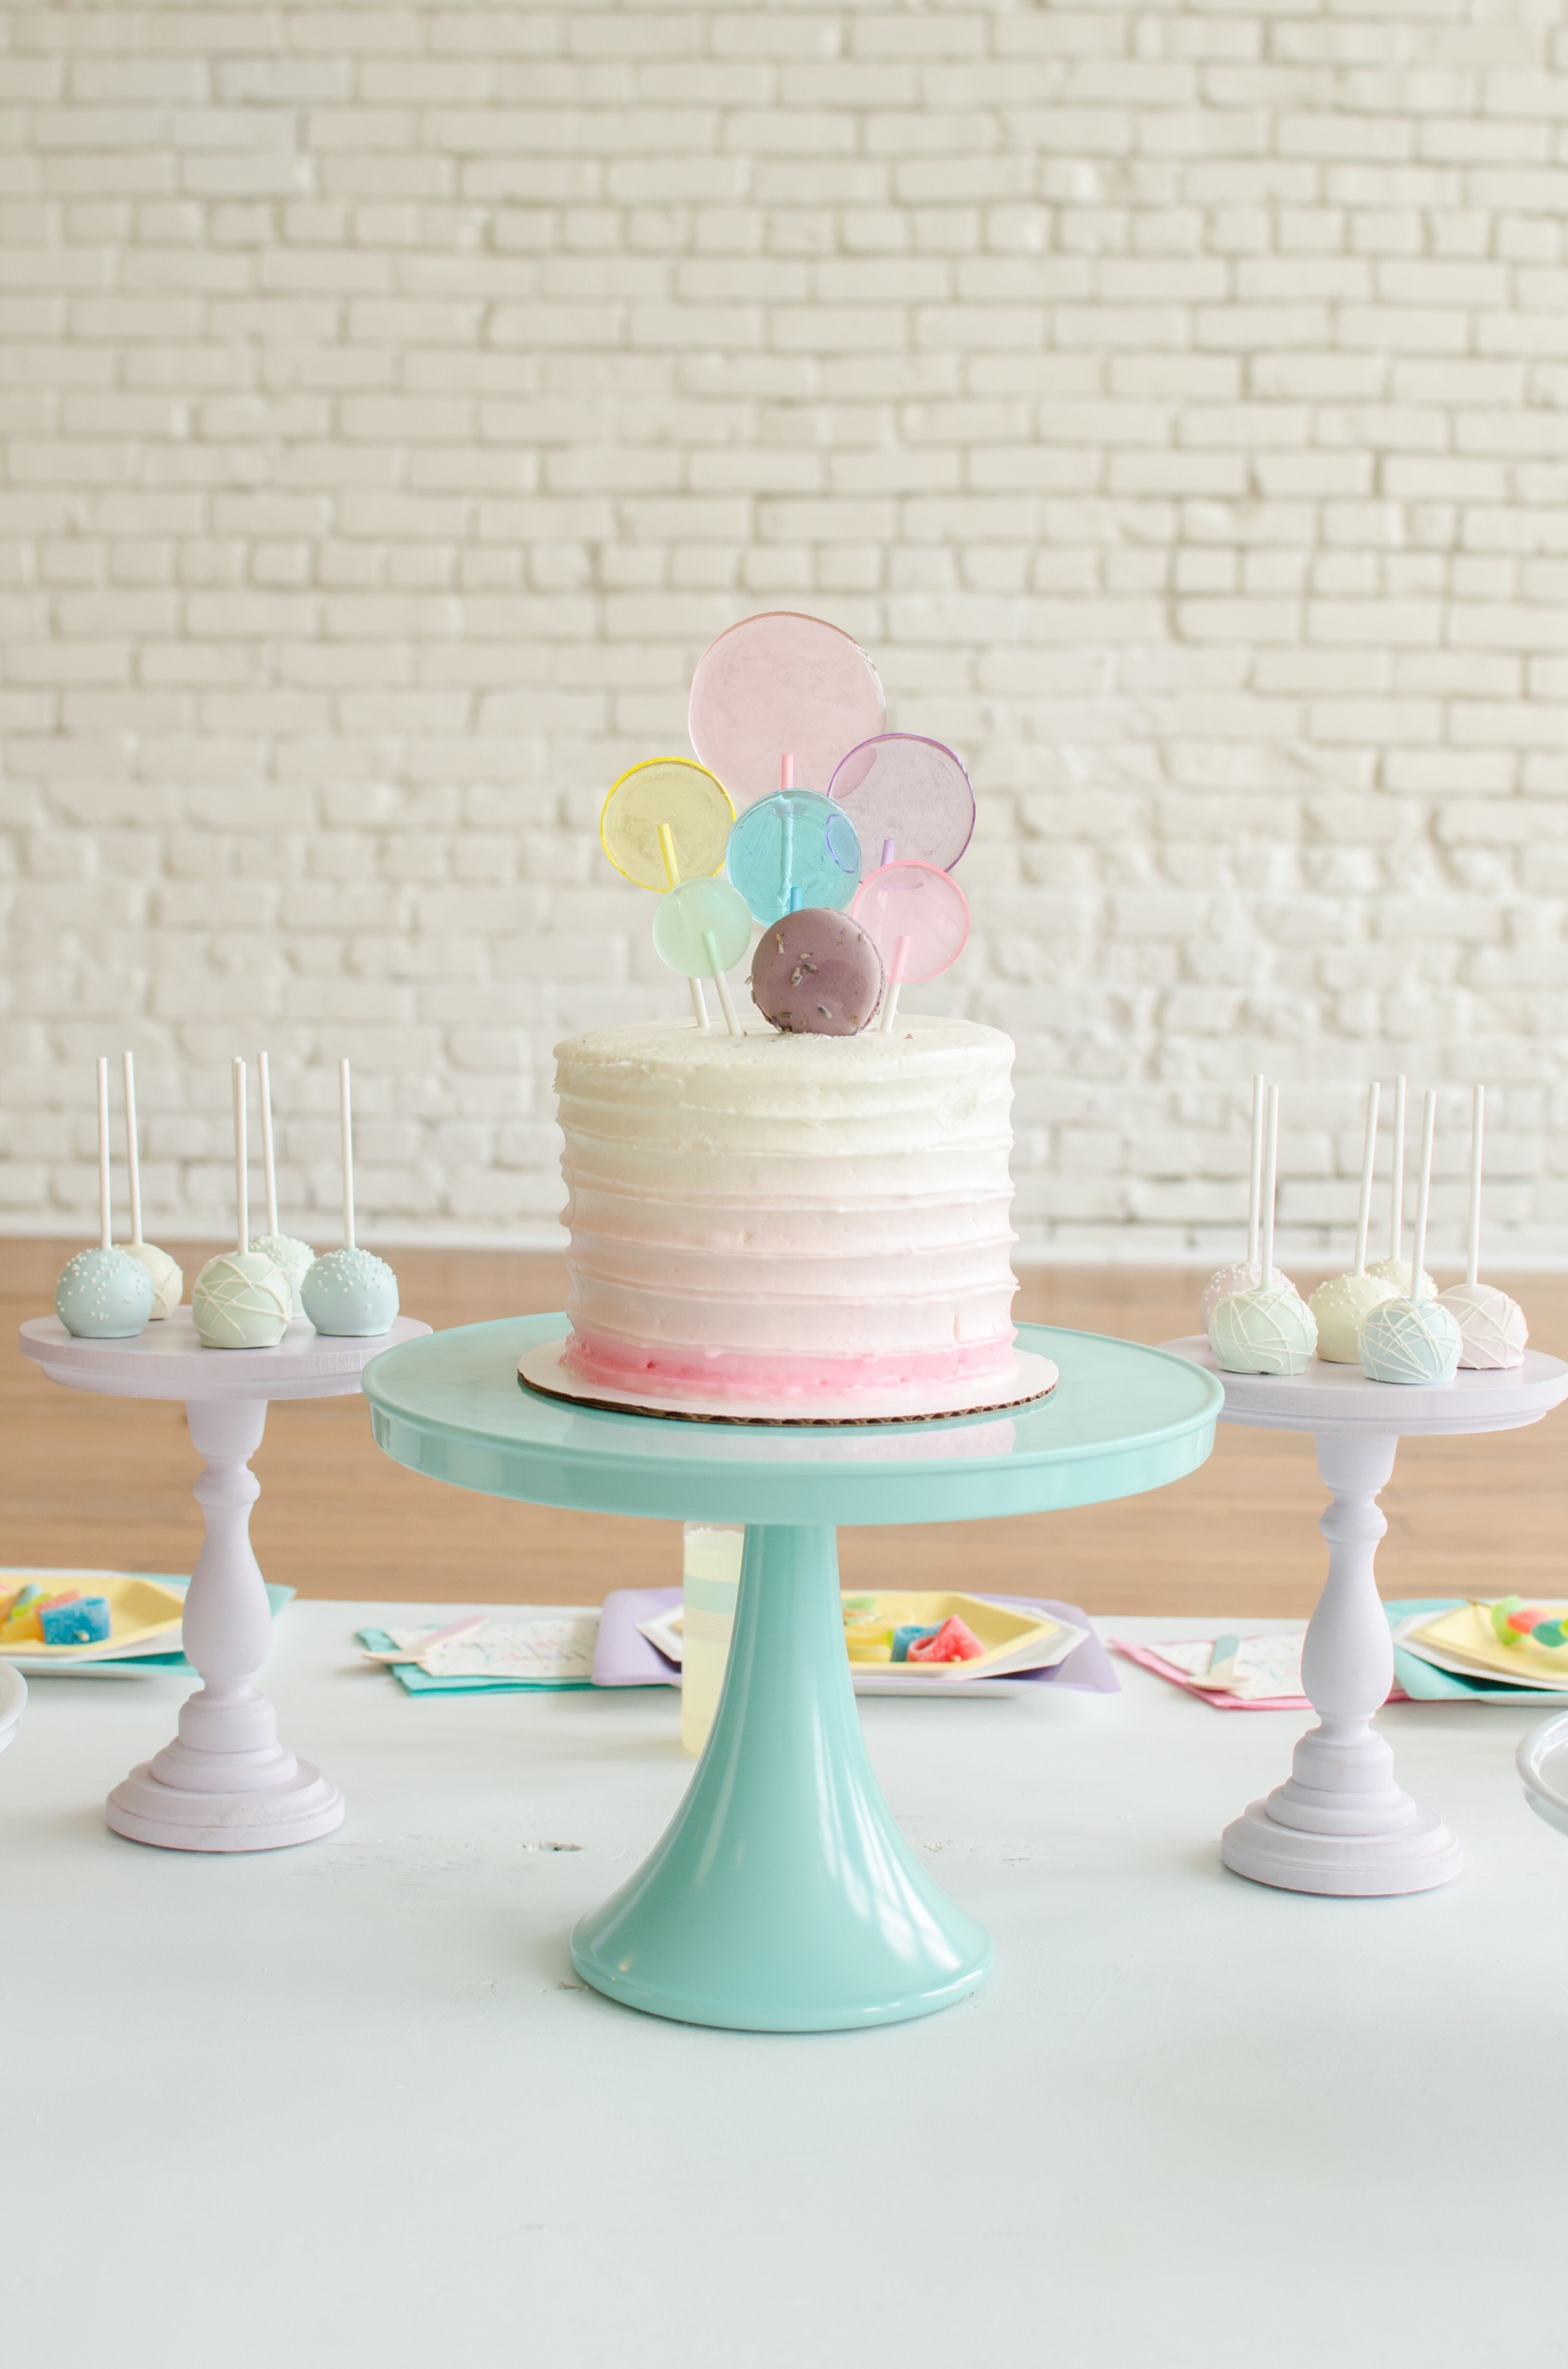 Cute girls birthday cake ideas from Mint Event Design